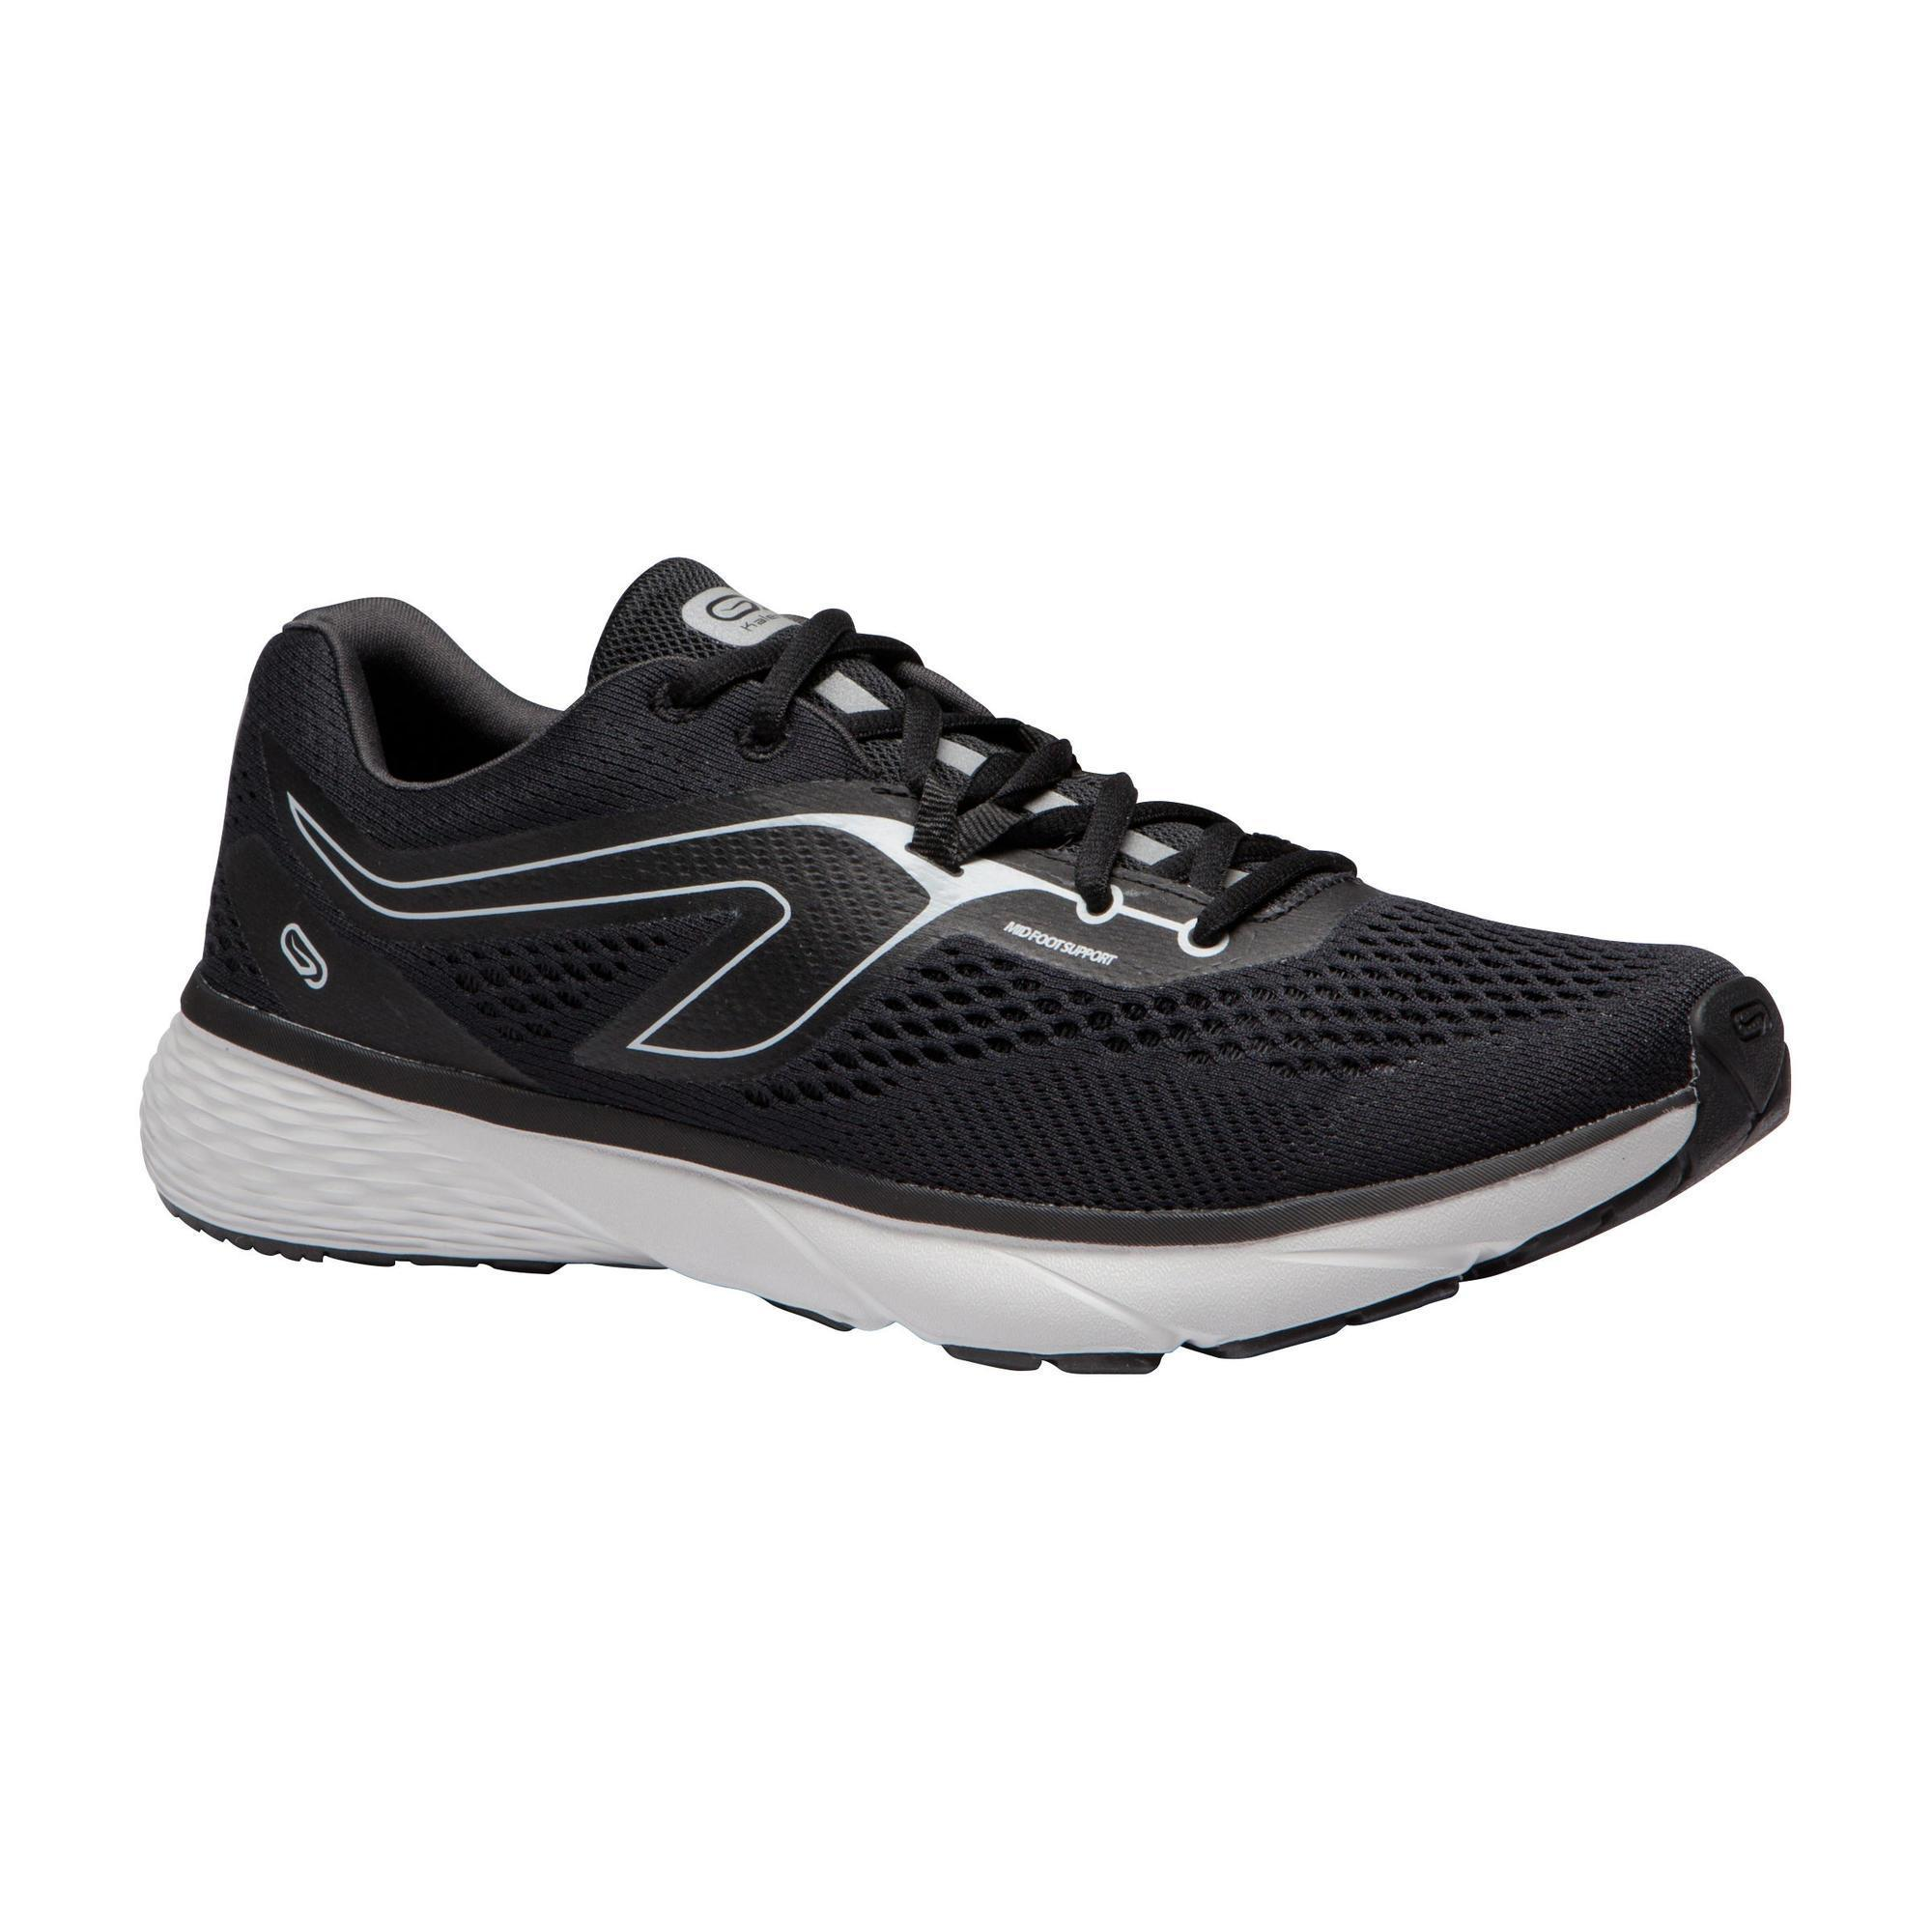 Laufschuhe Run Support Herren | Schuhe > Sportschuhe > Laufschuhe | Kalenji